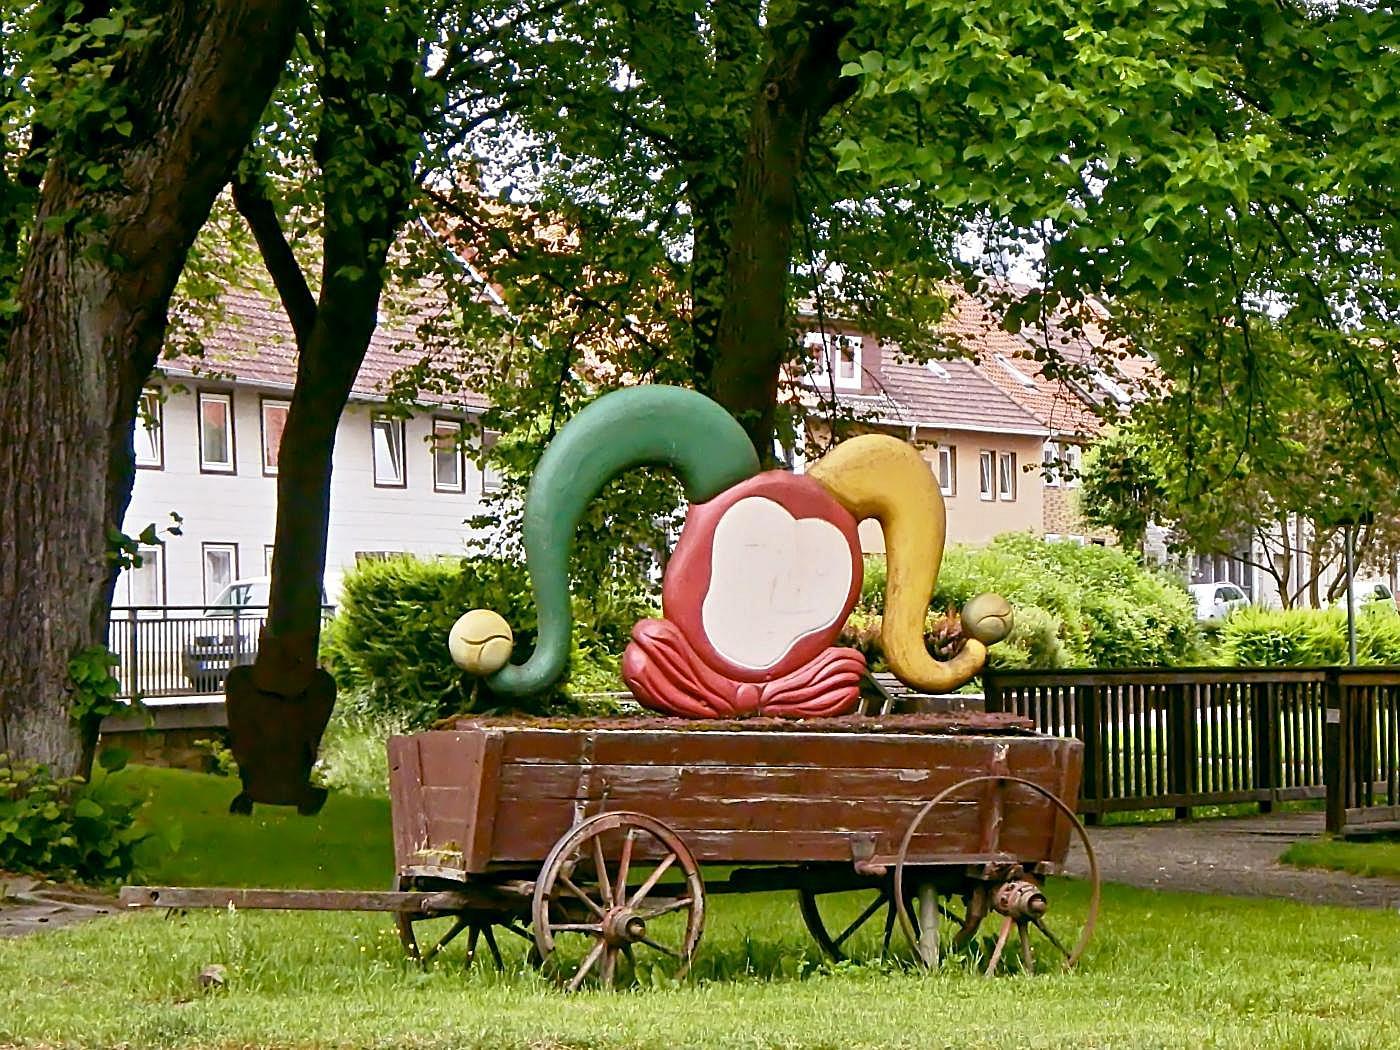 Till Eulenspiegel in Schöppenstedt